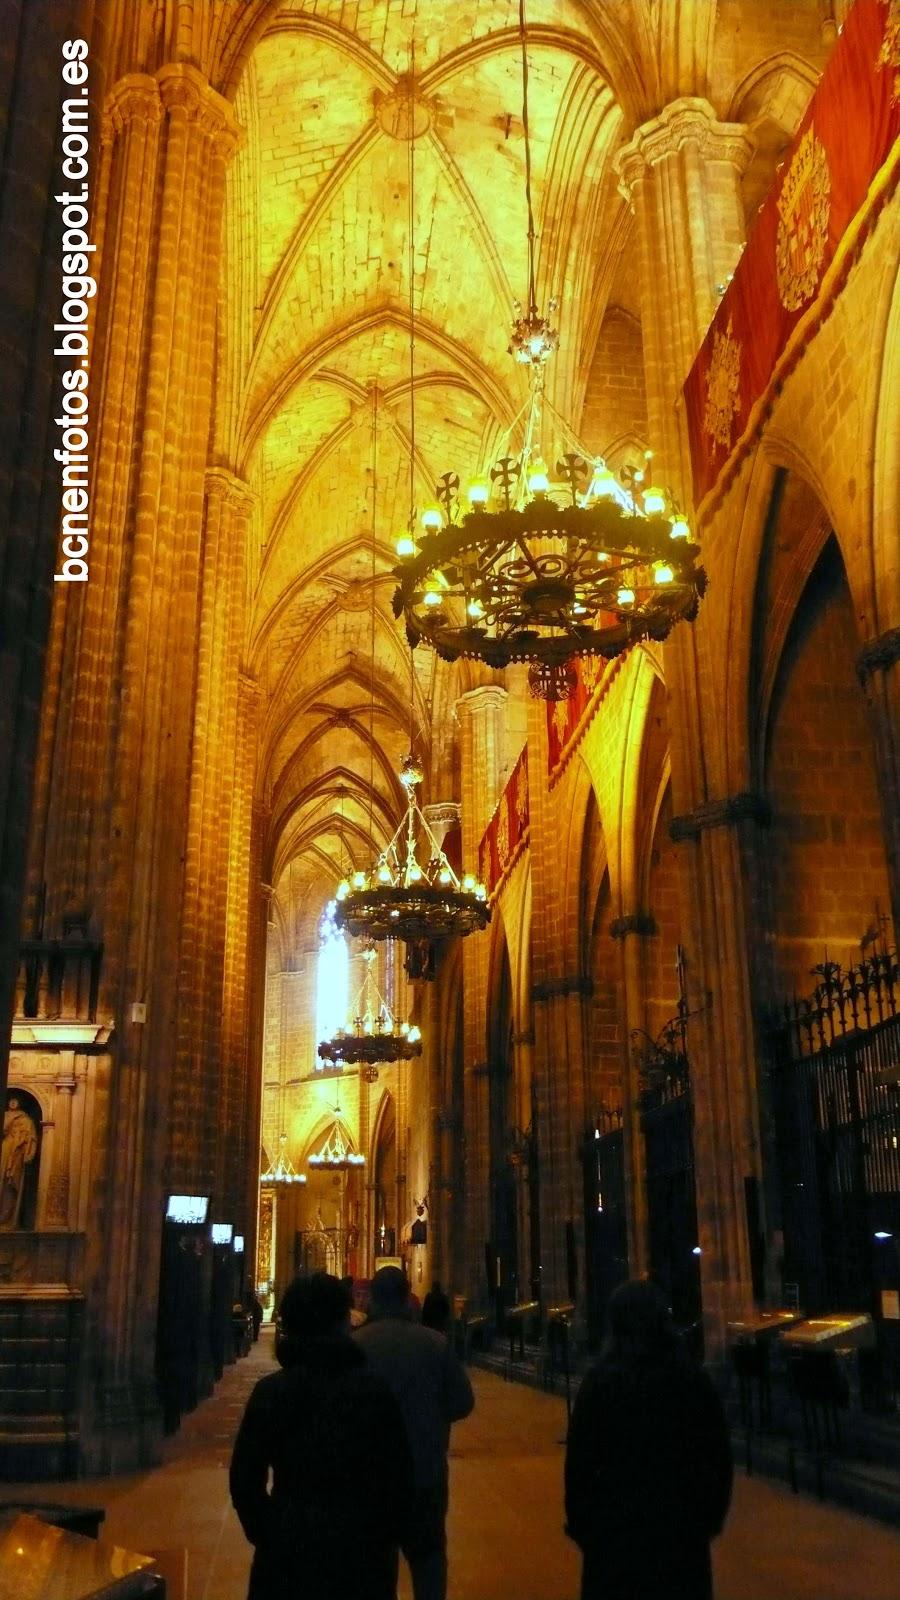 Mi barcelona la catedral de barcelona ii interiores y for Catedral de barcelona interior